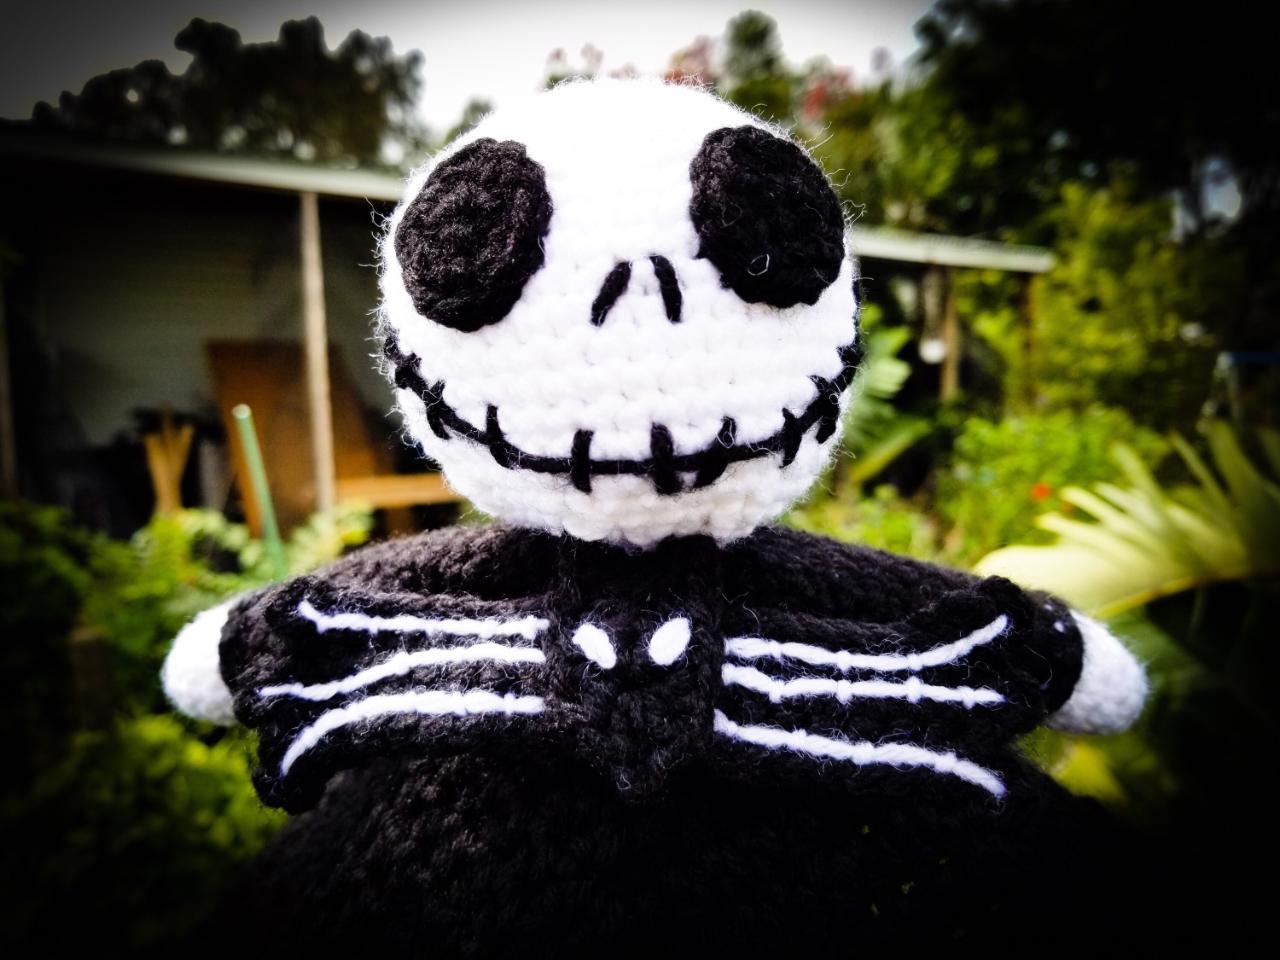 Cute & Creepy Crocheted Creatures   960x1280